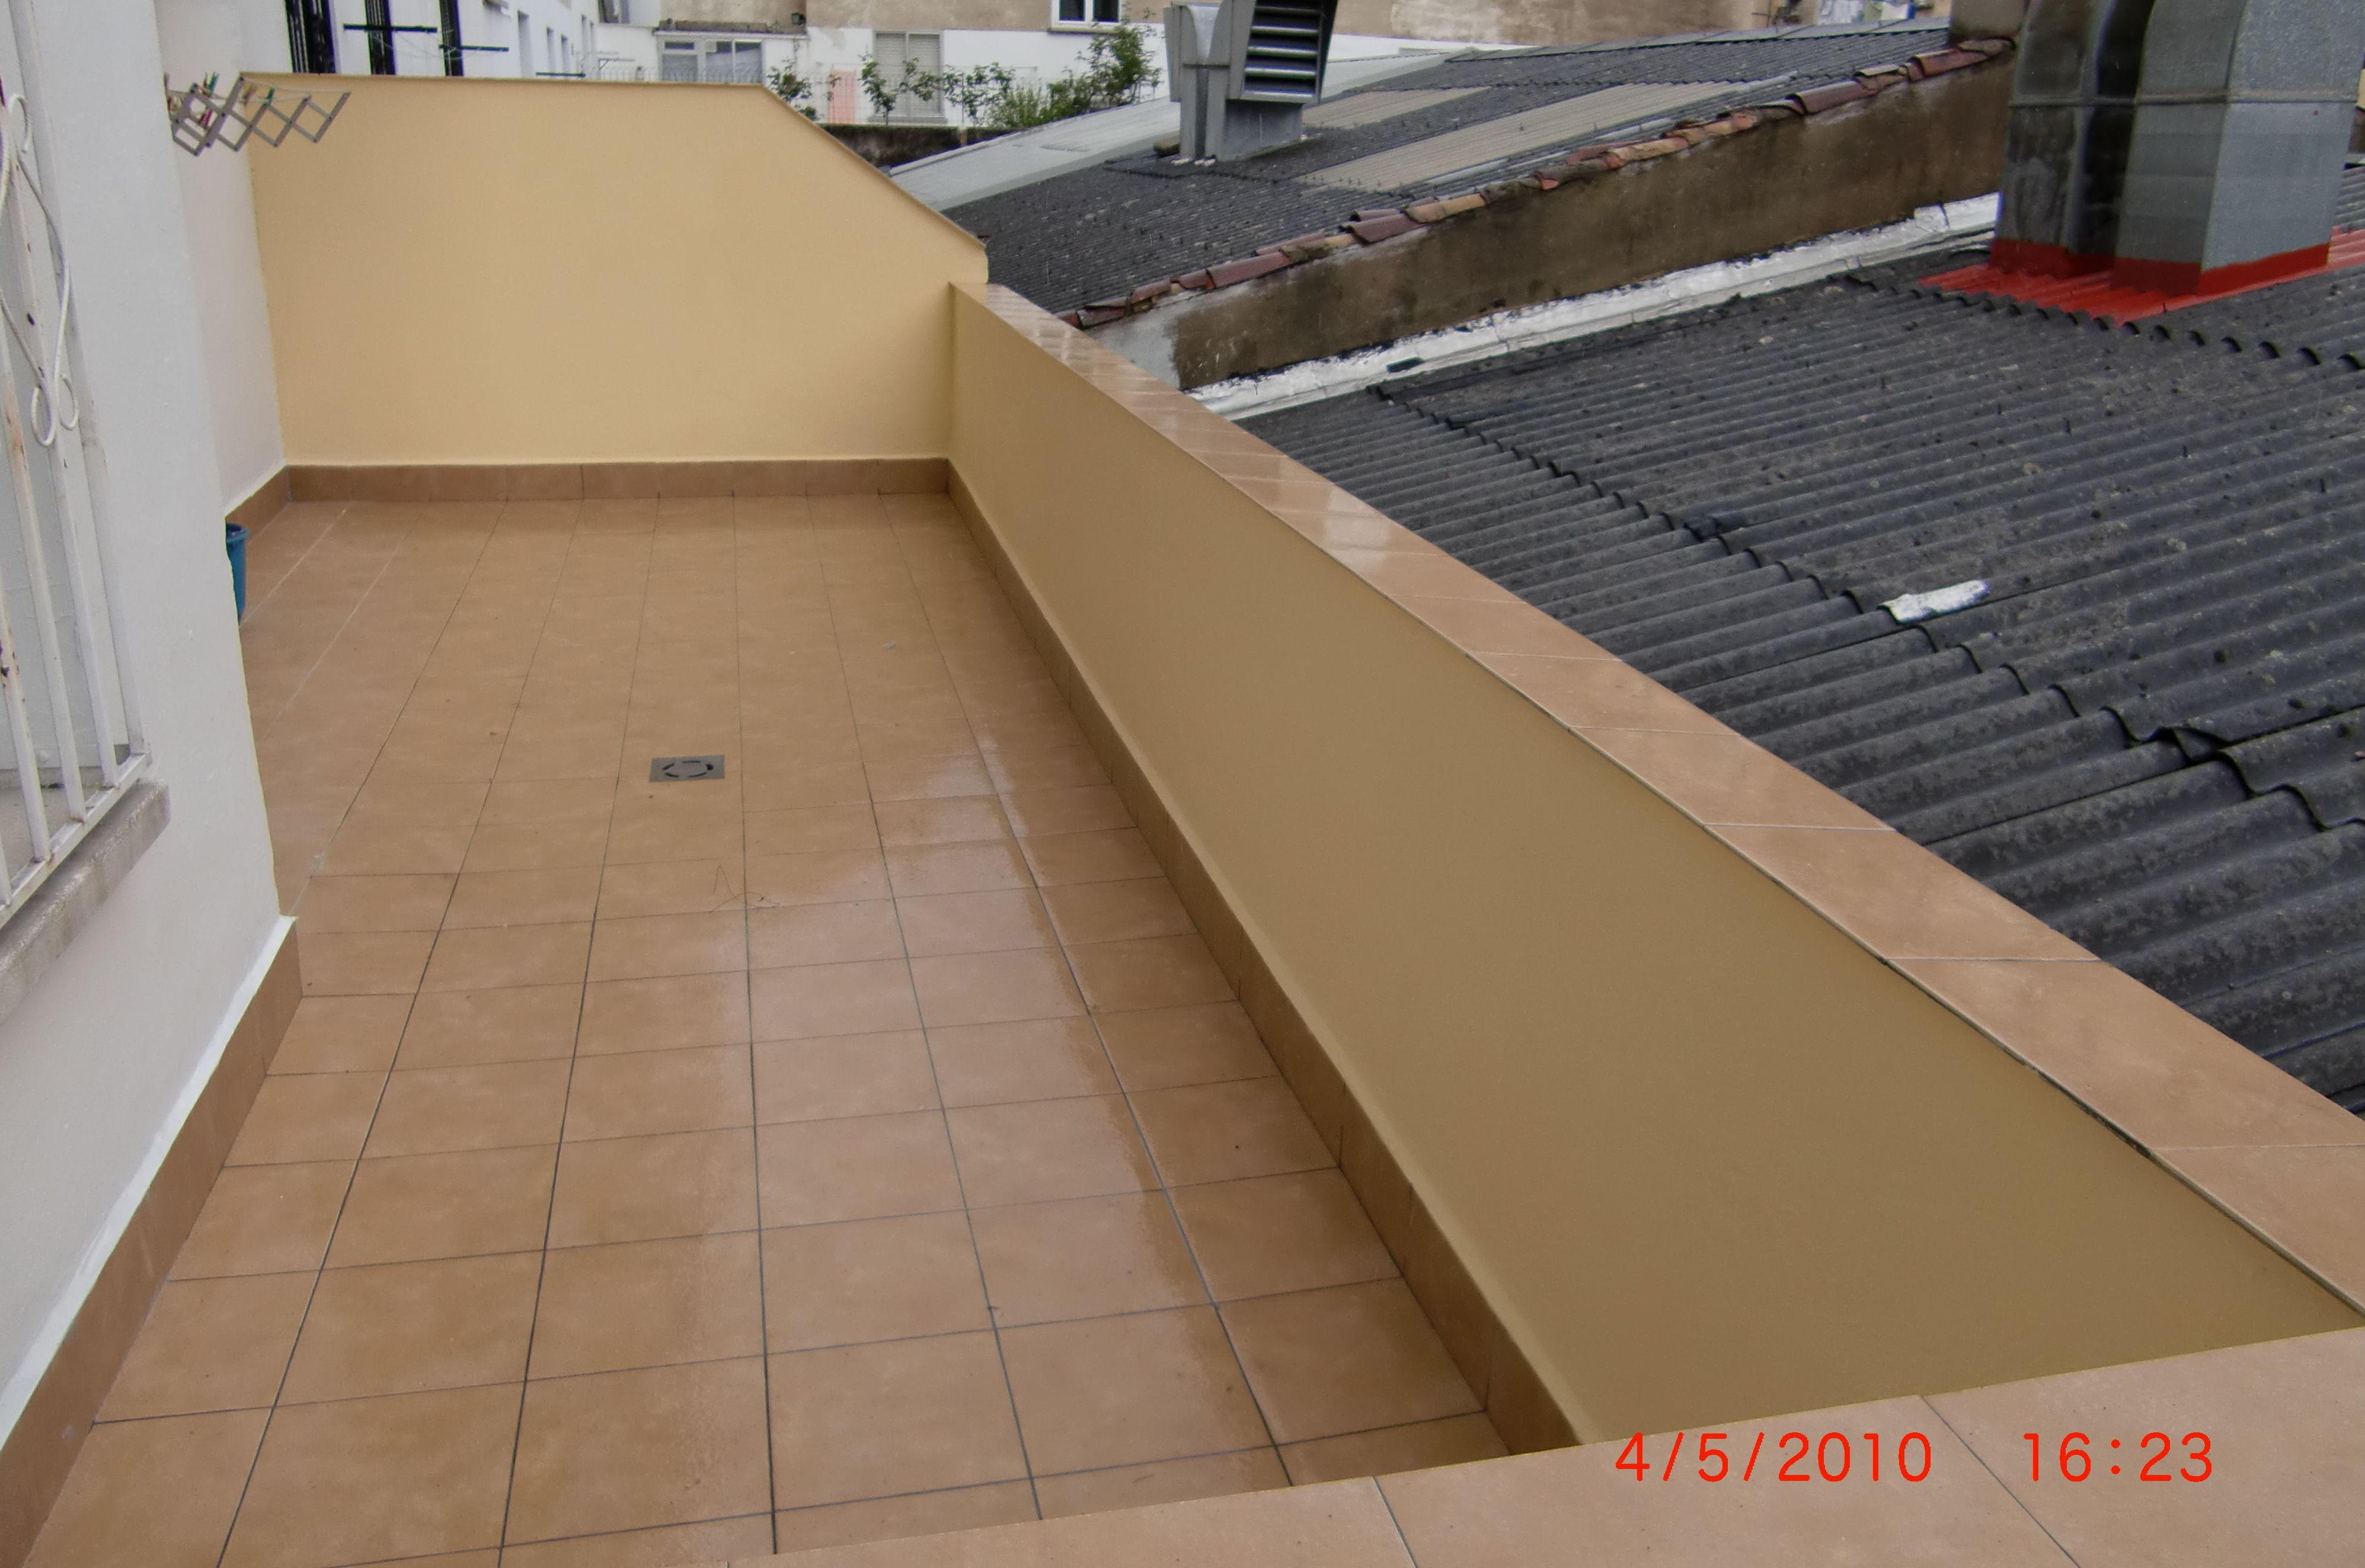 Empresa de impermeabilizaciones en Vitoria-Gasteiz